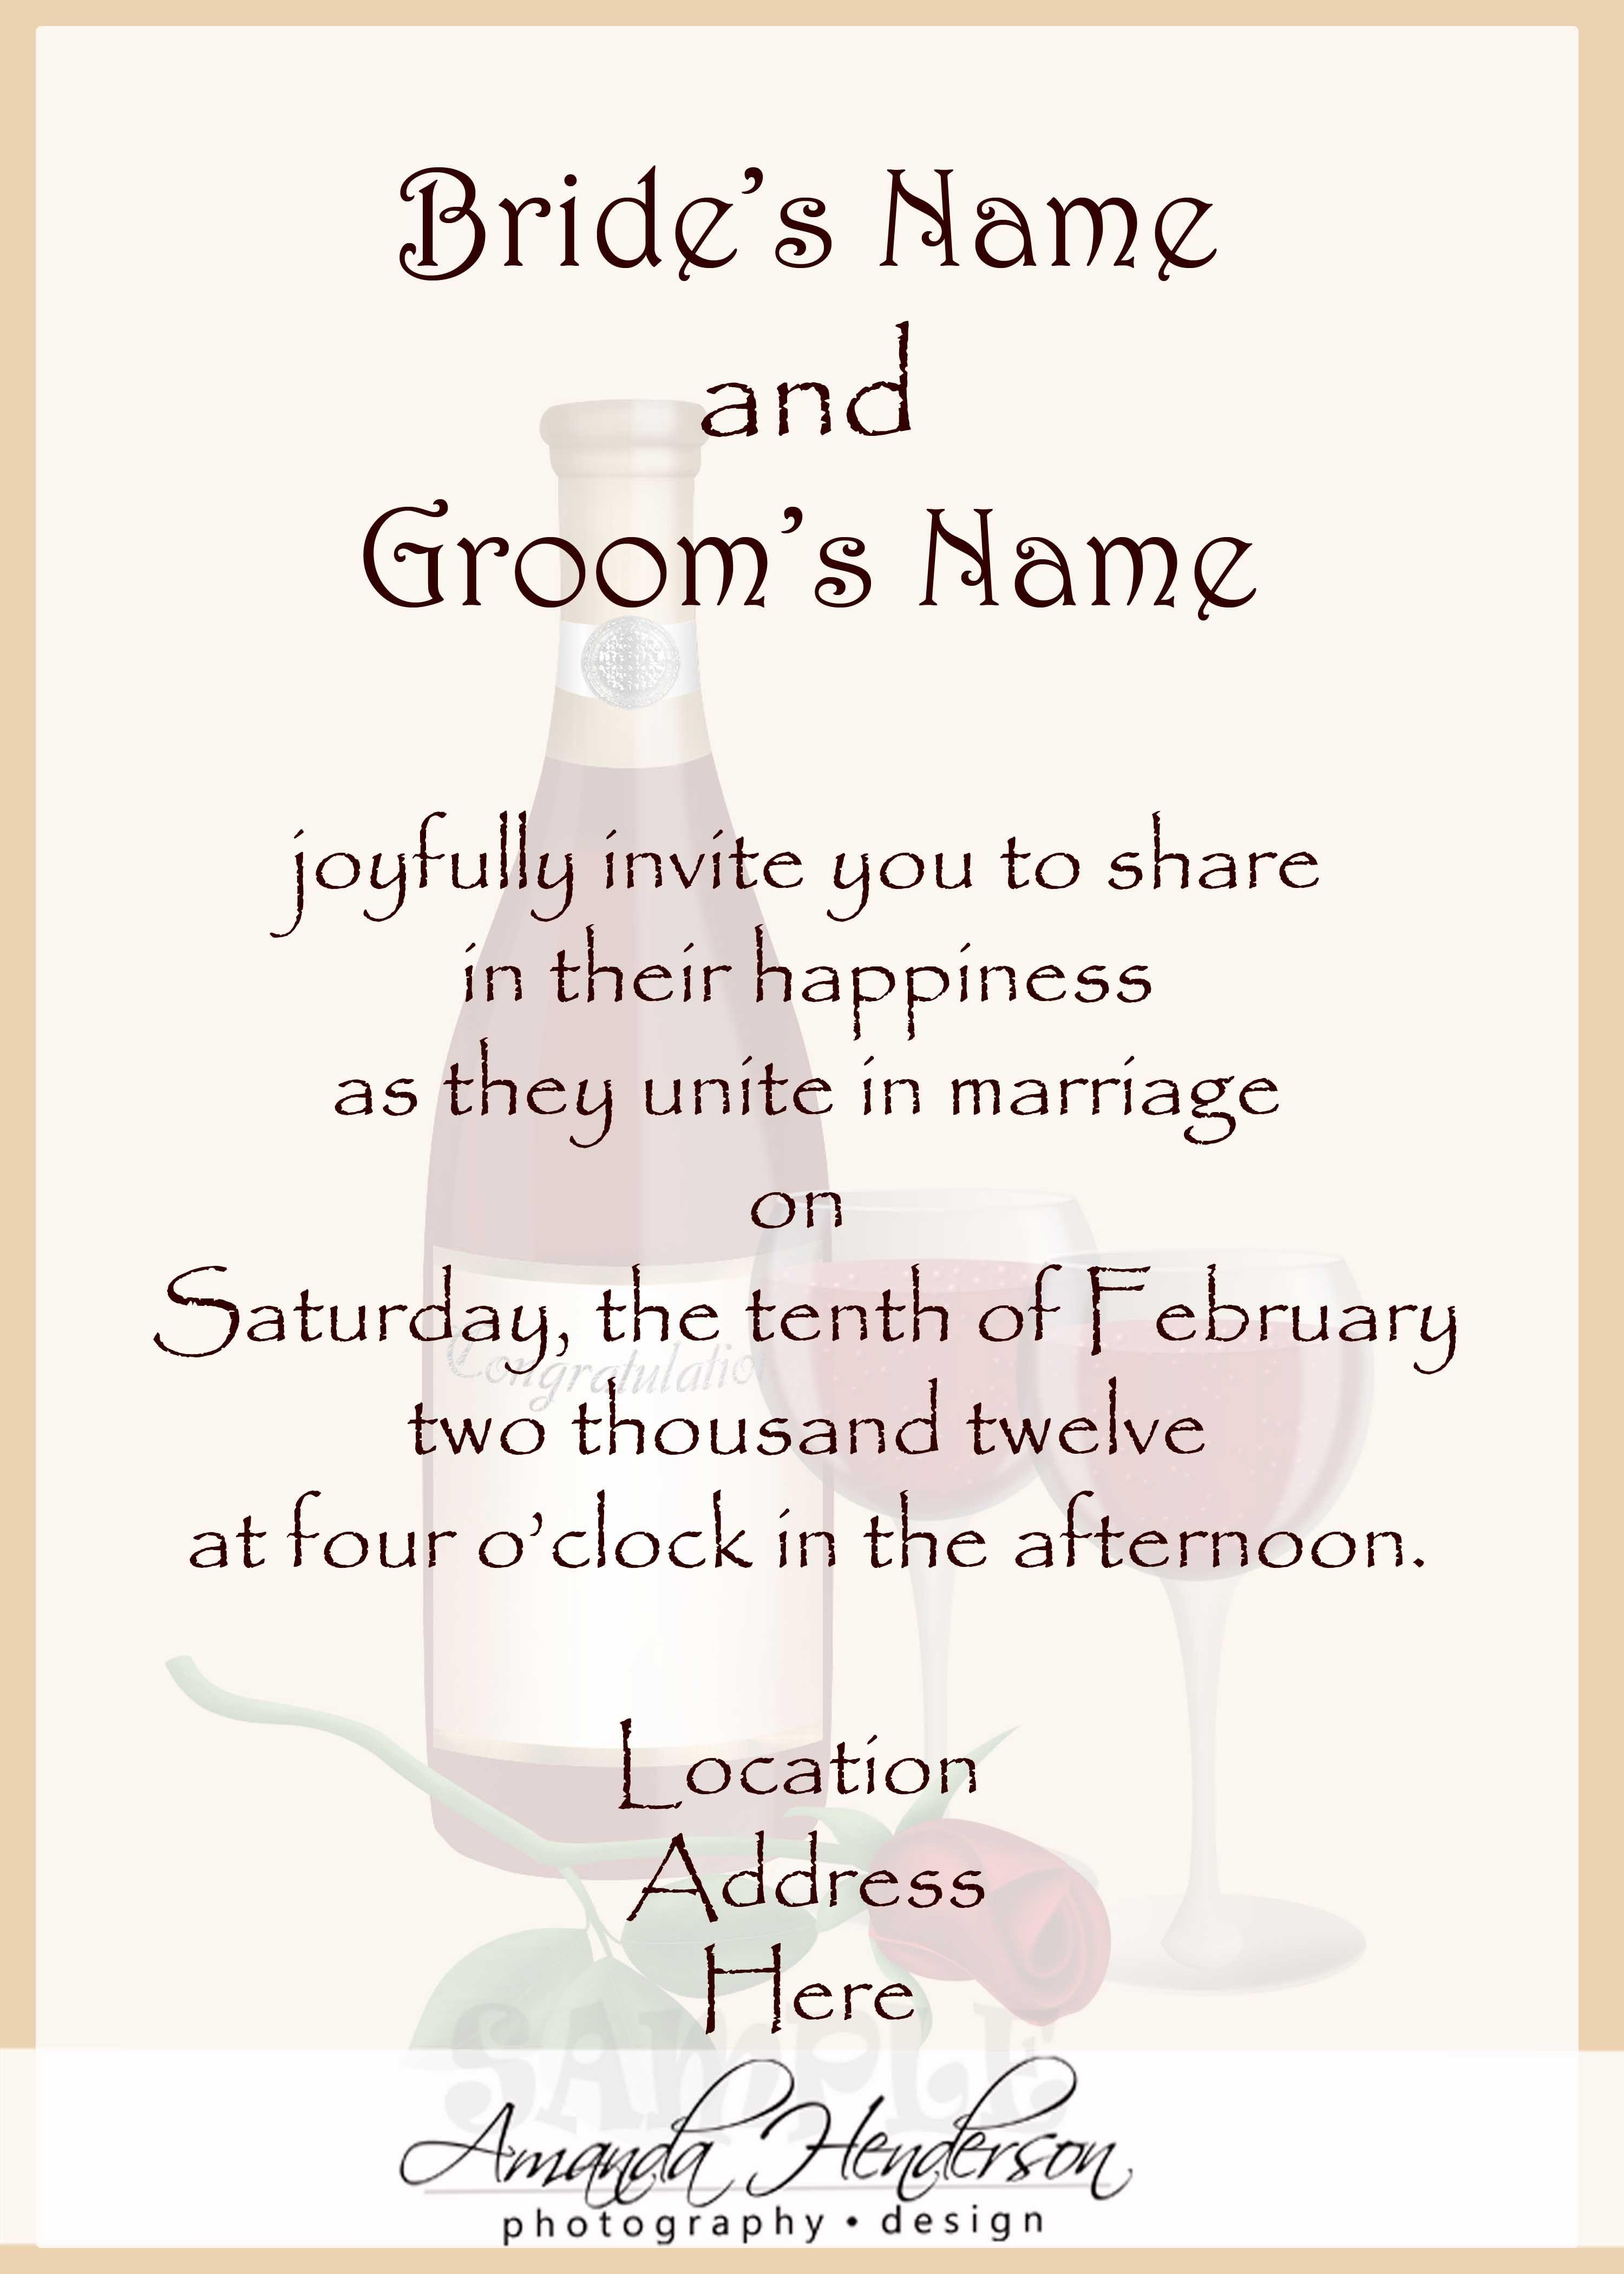 photo wedding invitations Unique wedding invitation